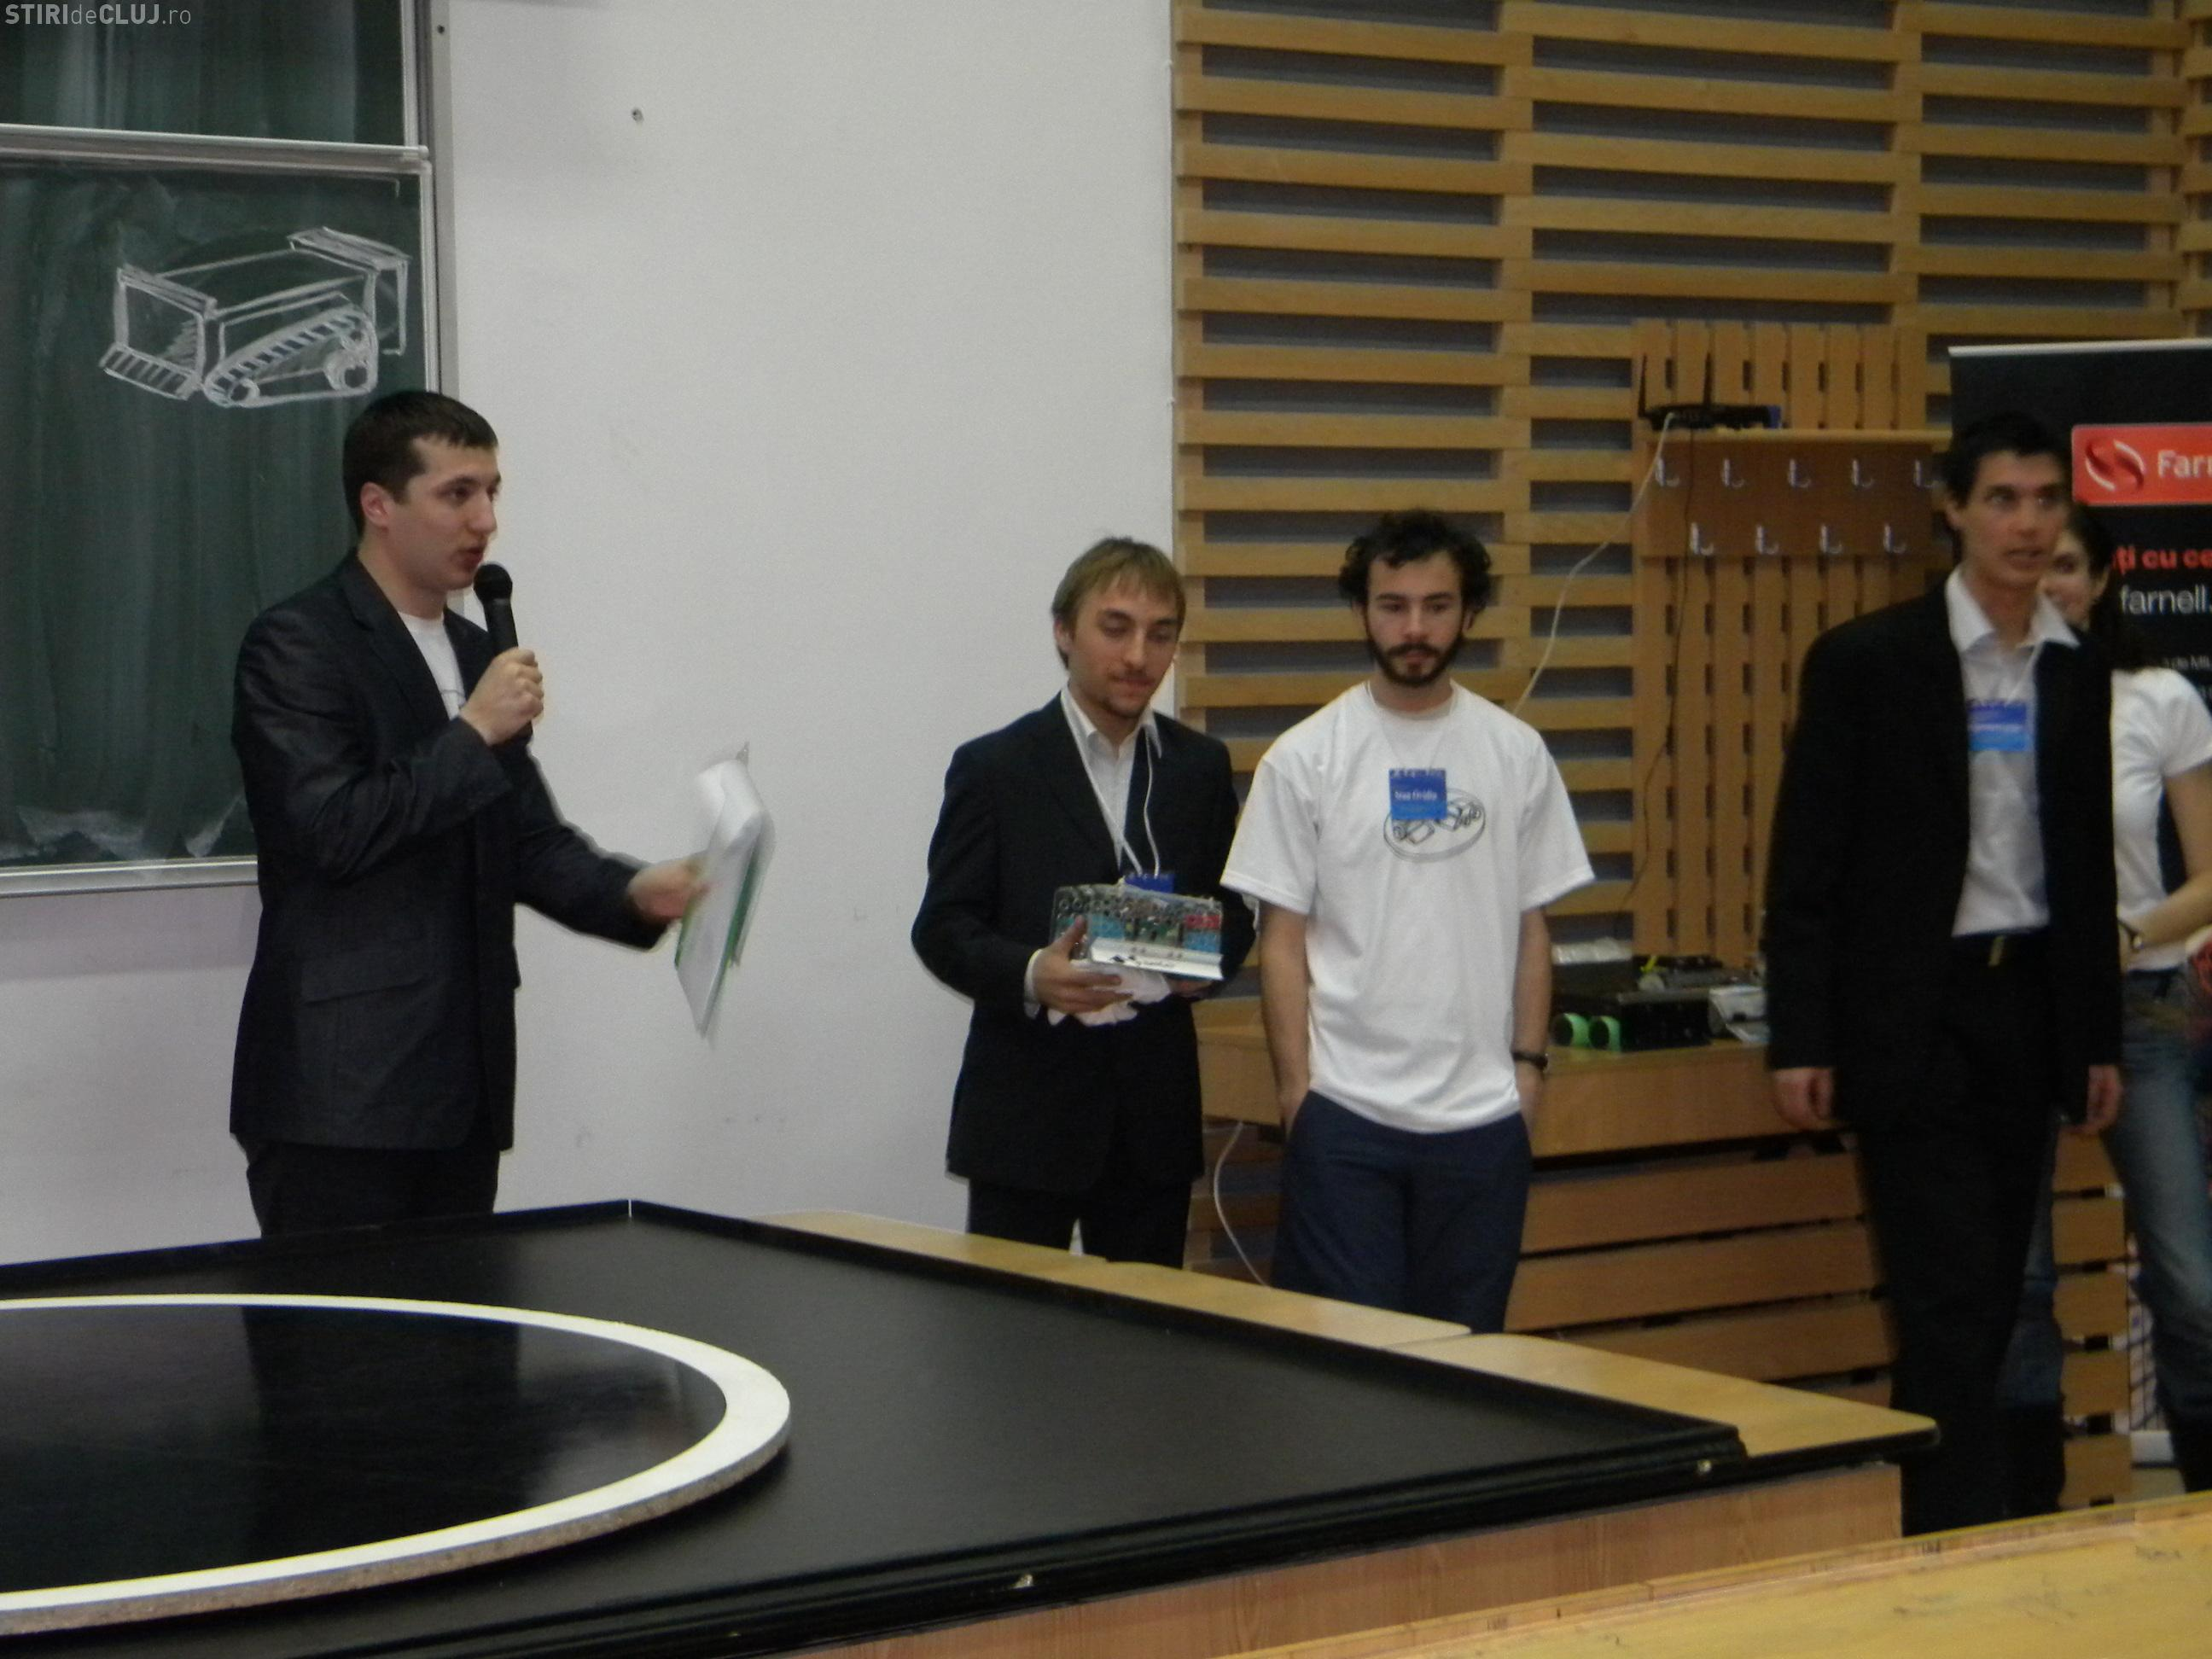 Vezi cine a castigat BattleLab Robotica 2011 Cluj!